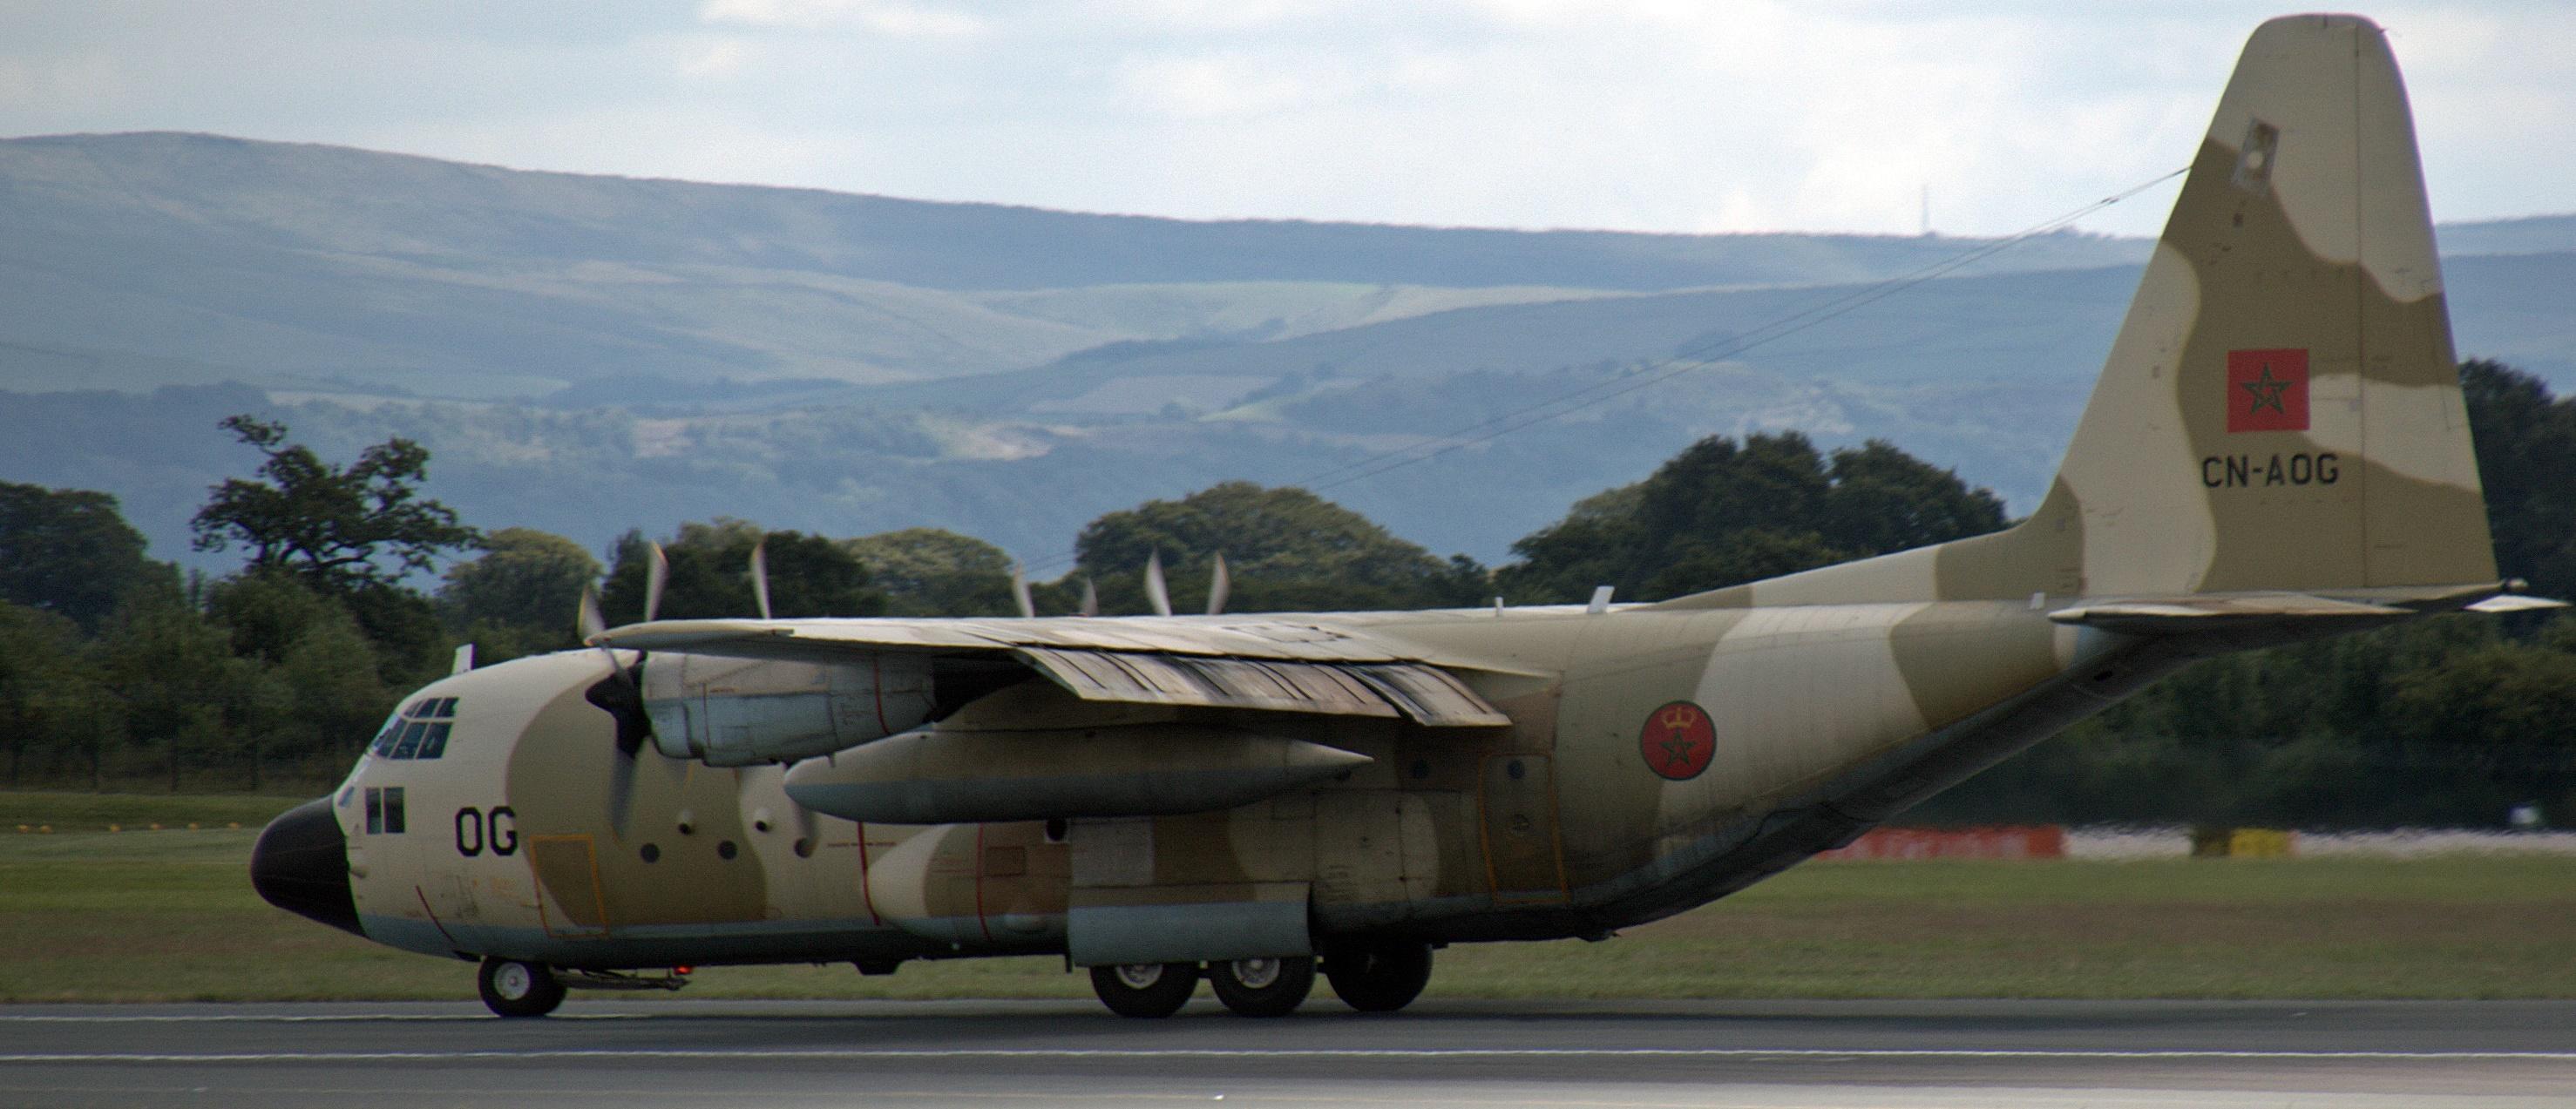 FRA: Photos d'avions de transport - Page 31 35749843141_9d062595b8_o